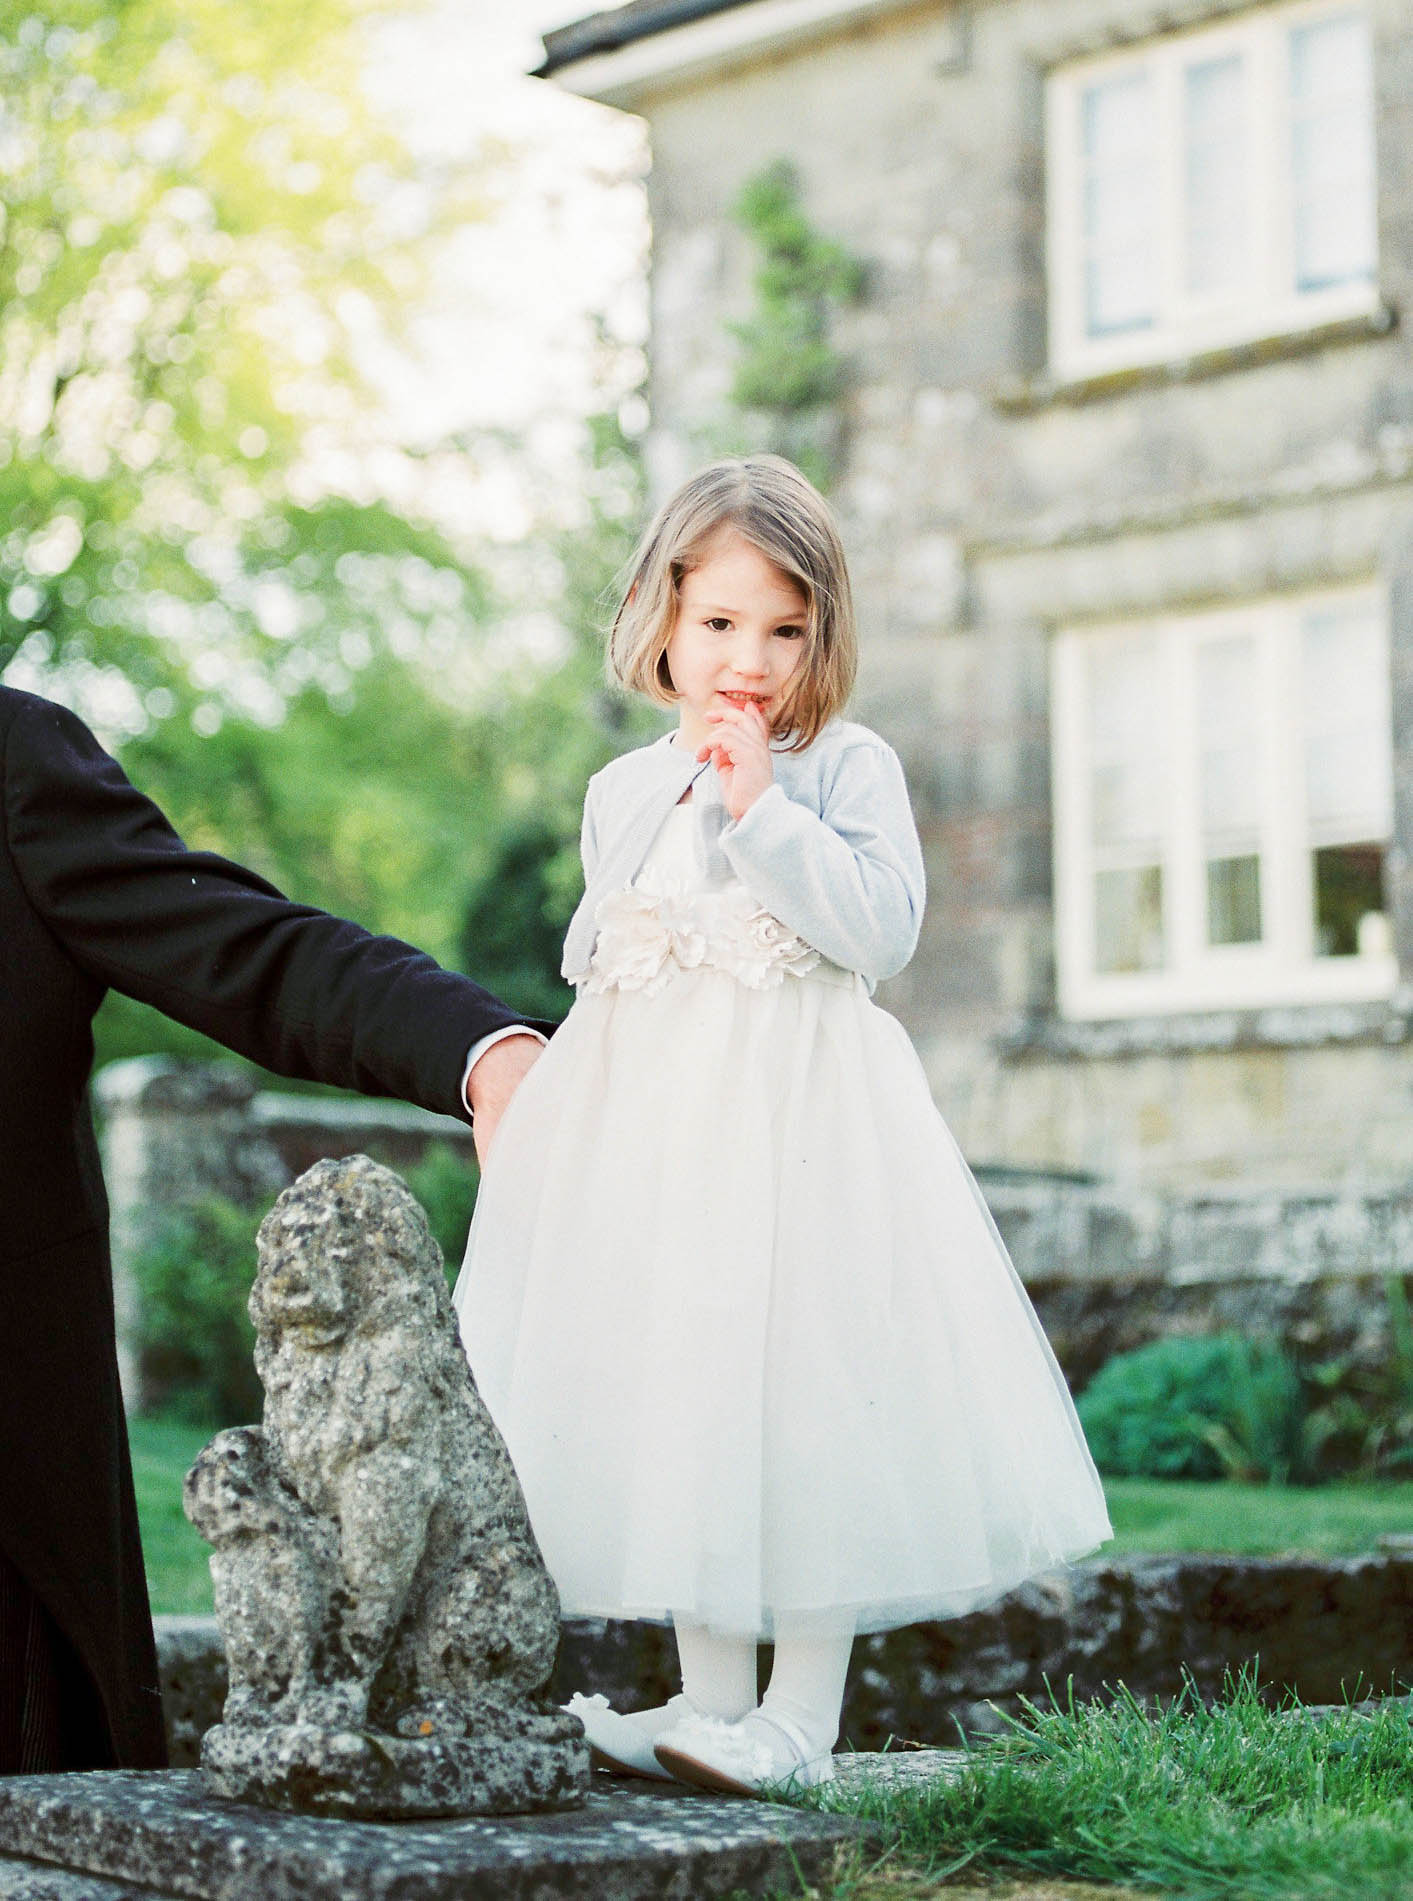 Amy O'Boyle Photography- Destination & UK Fine Art Film Wedding Photographer- English Countryside Wedding-100.jpg